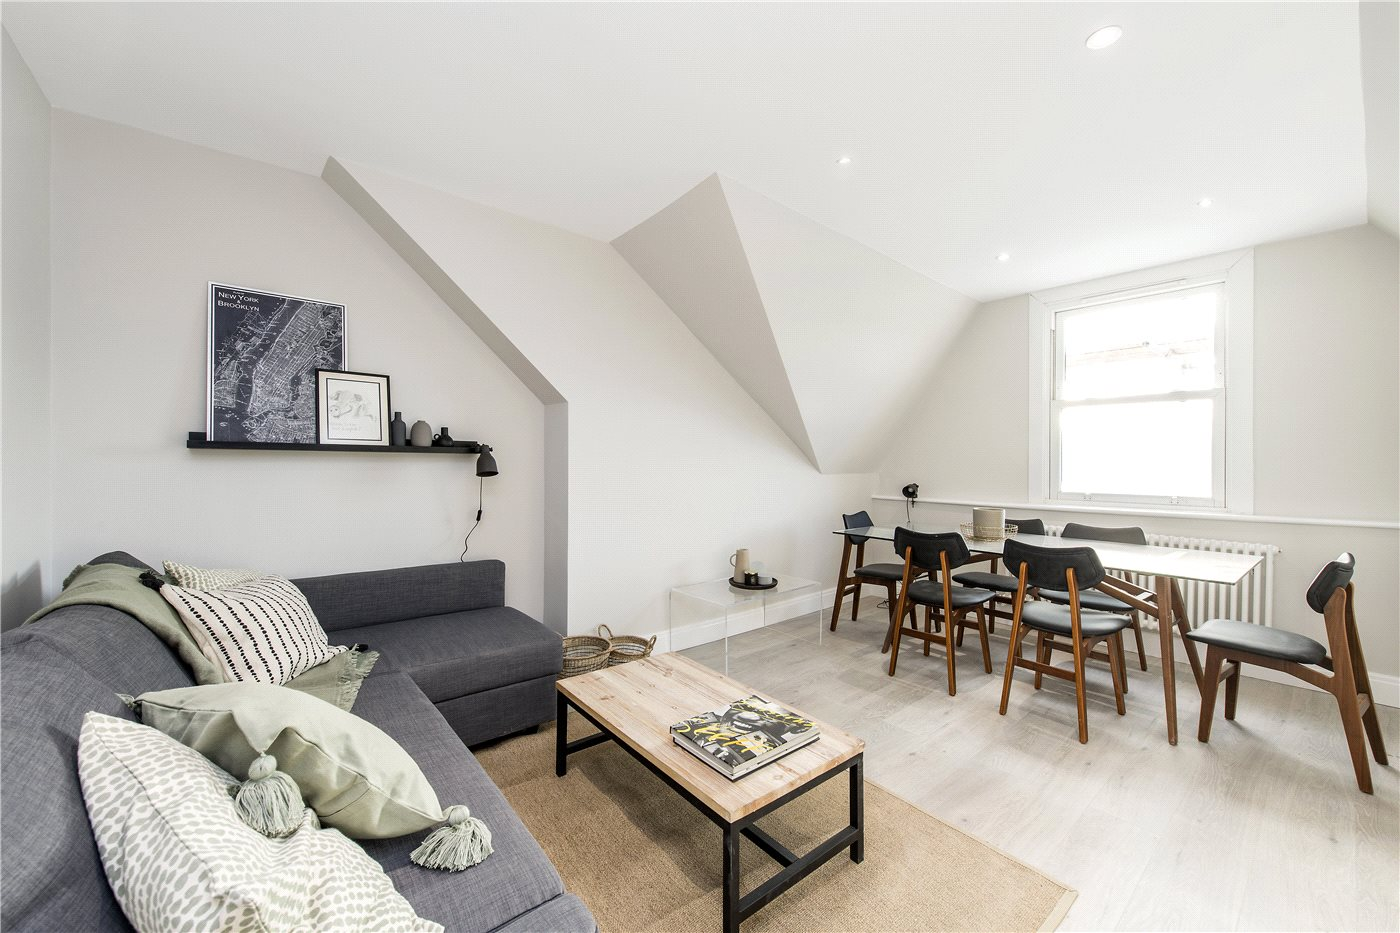 2 bedroom property for sale in Deronda Road, London, SE24 - £430,000